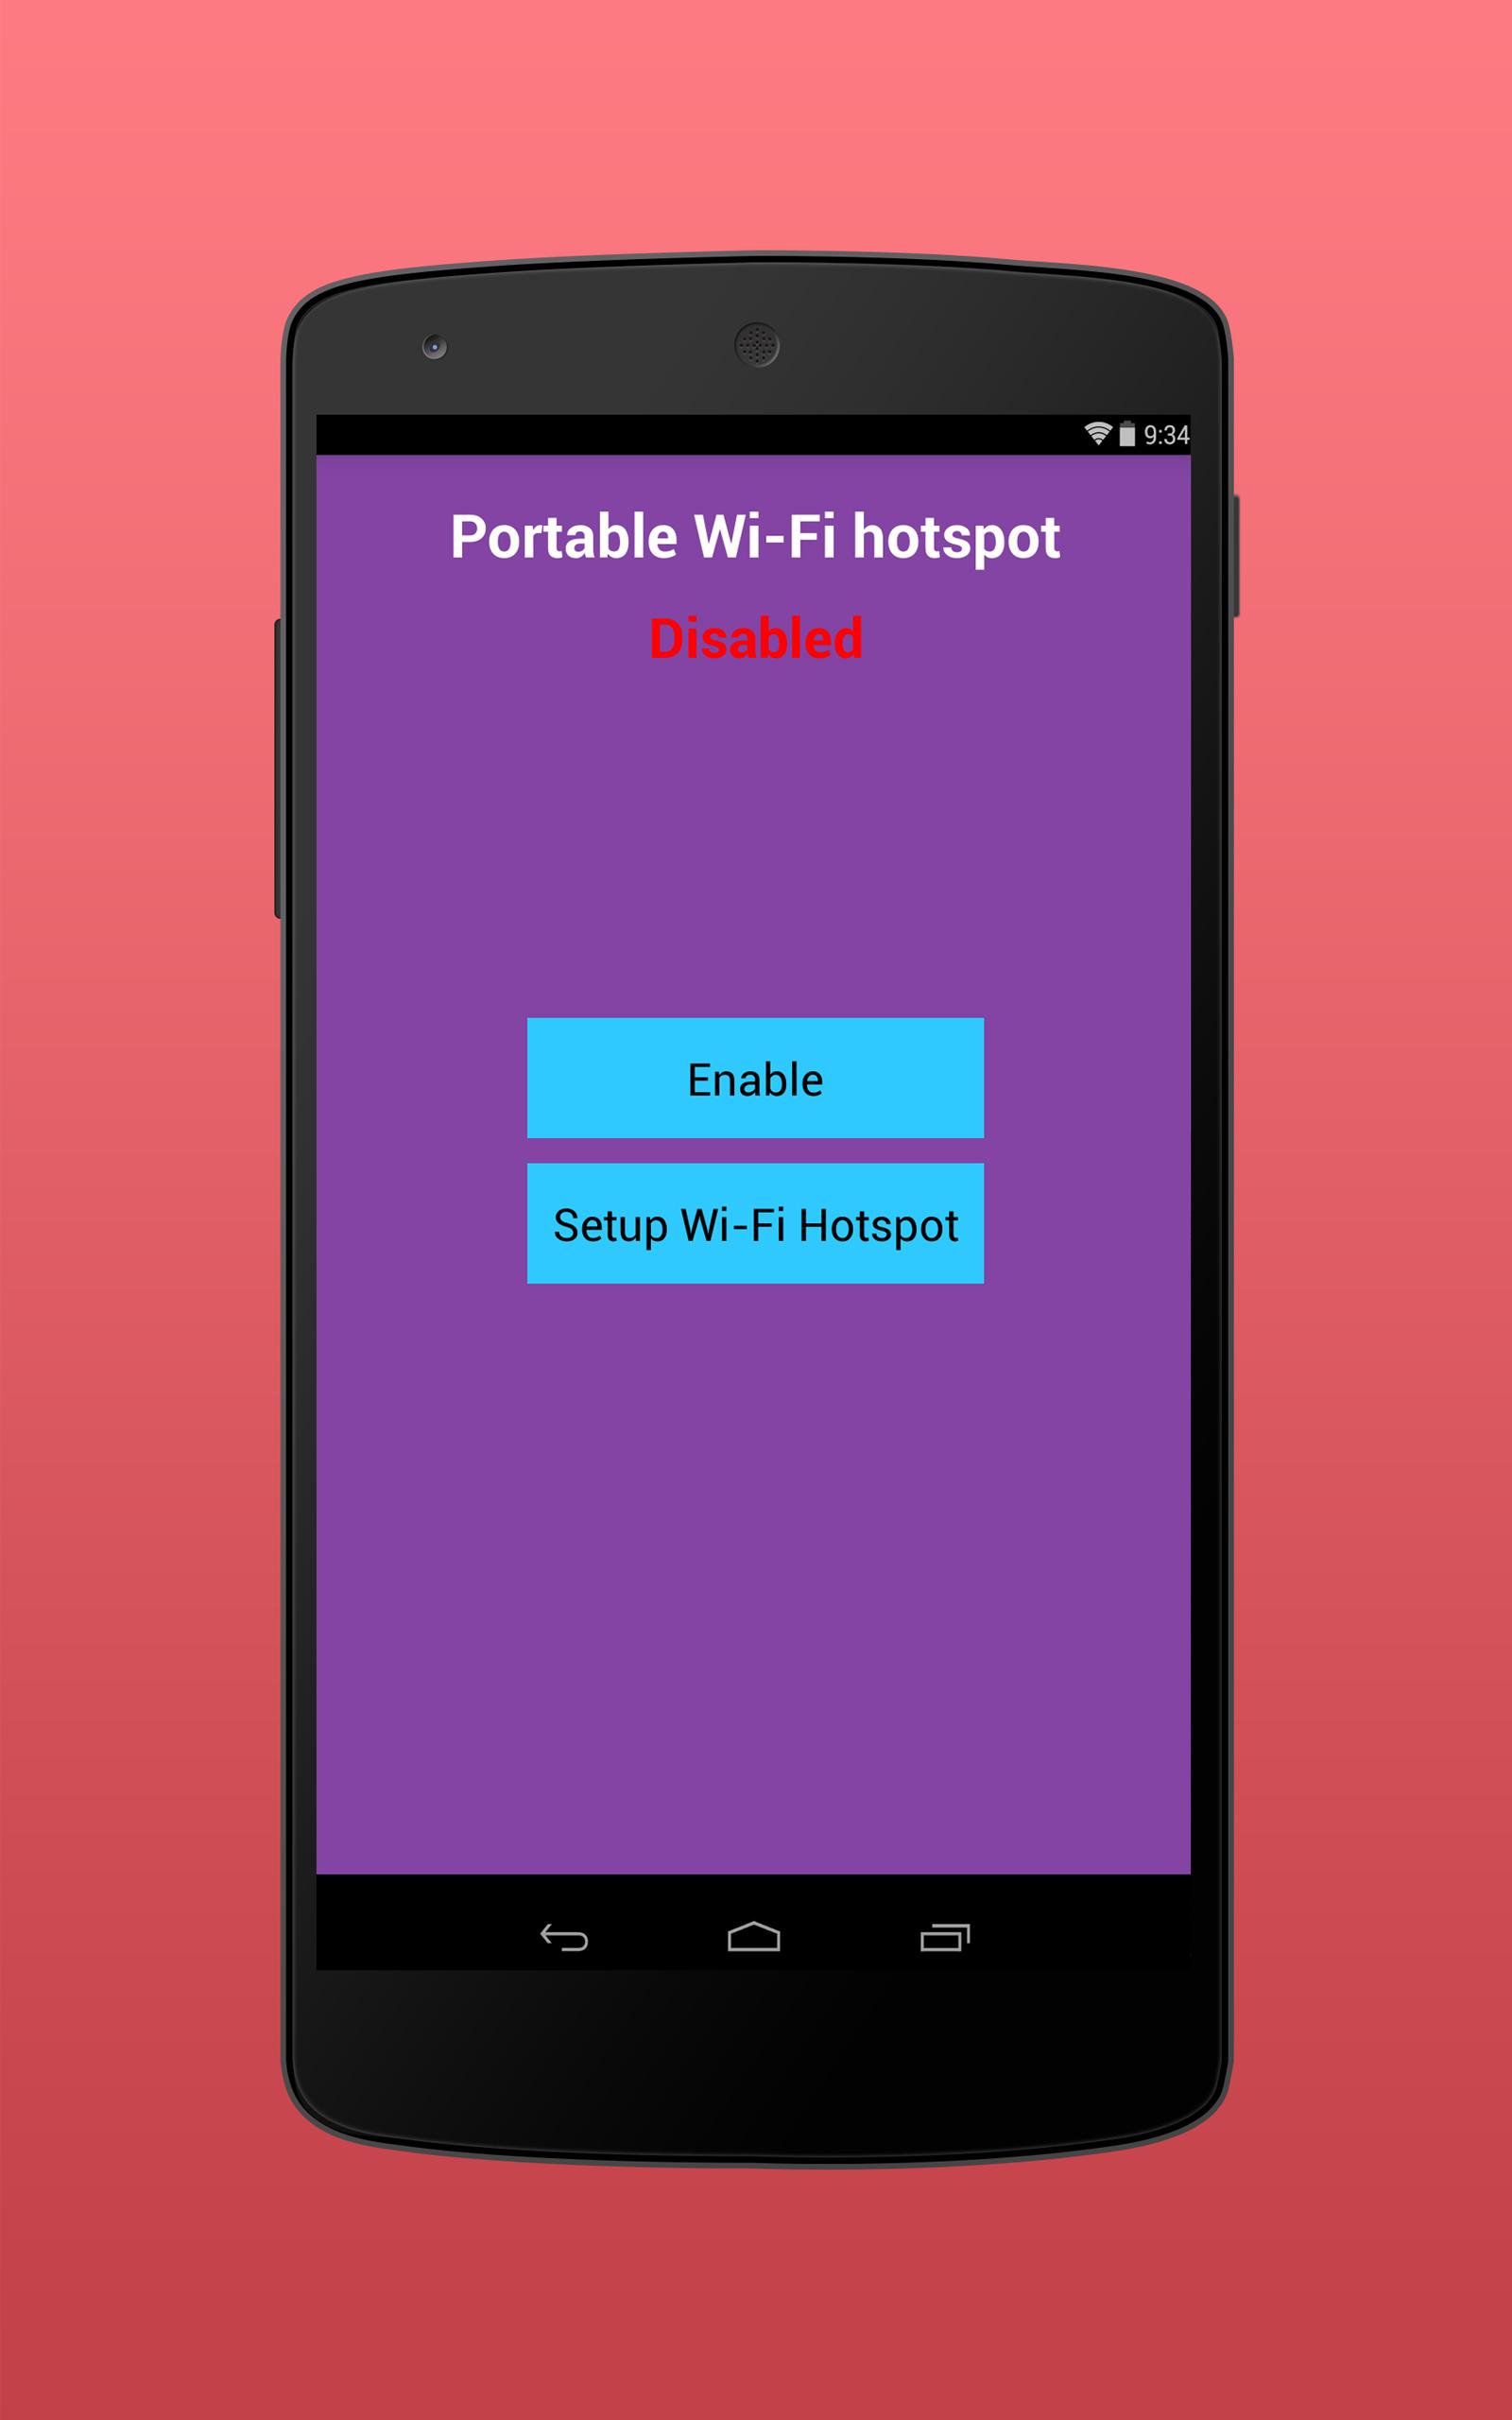 Portable Wi-Fi hotspot